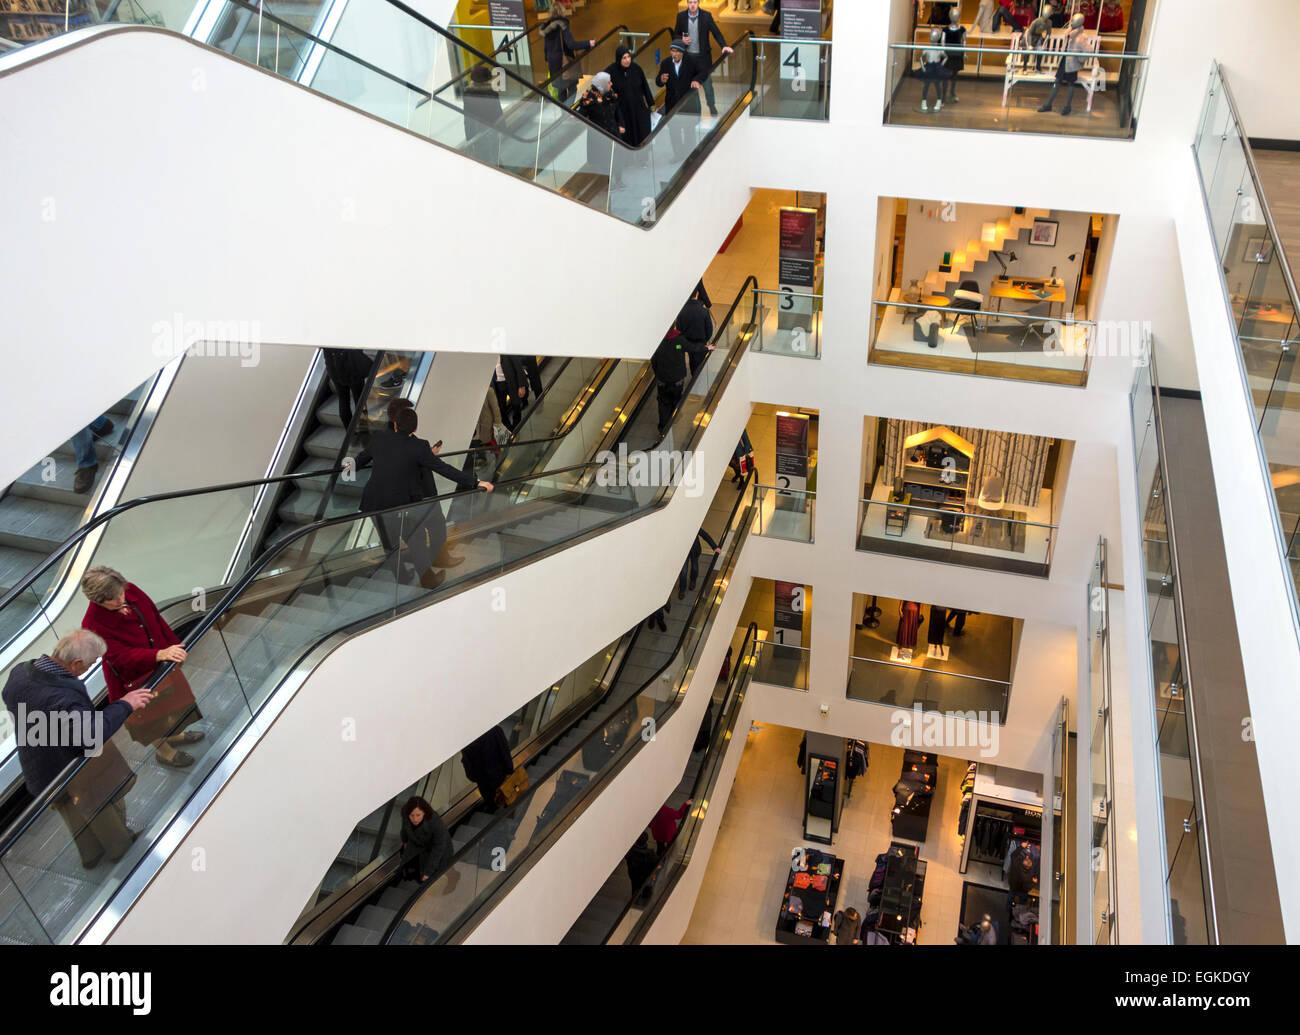 Escalators at John Lewis Dept. Store - Stock Image